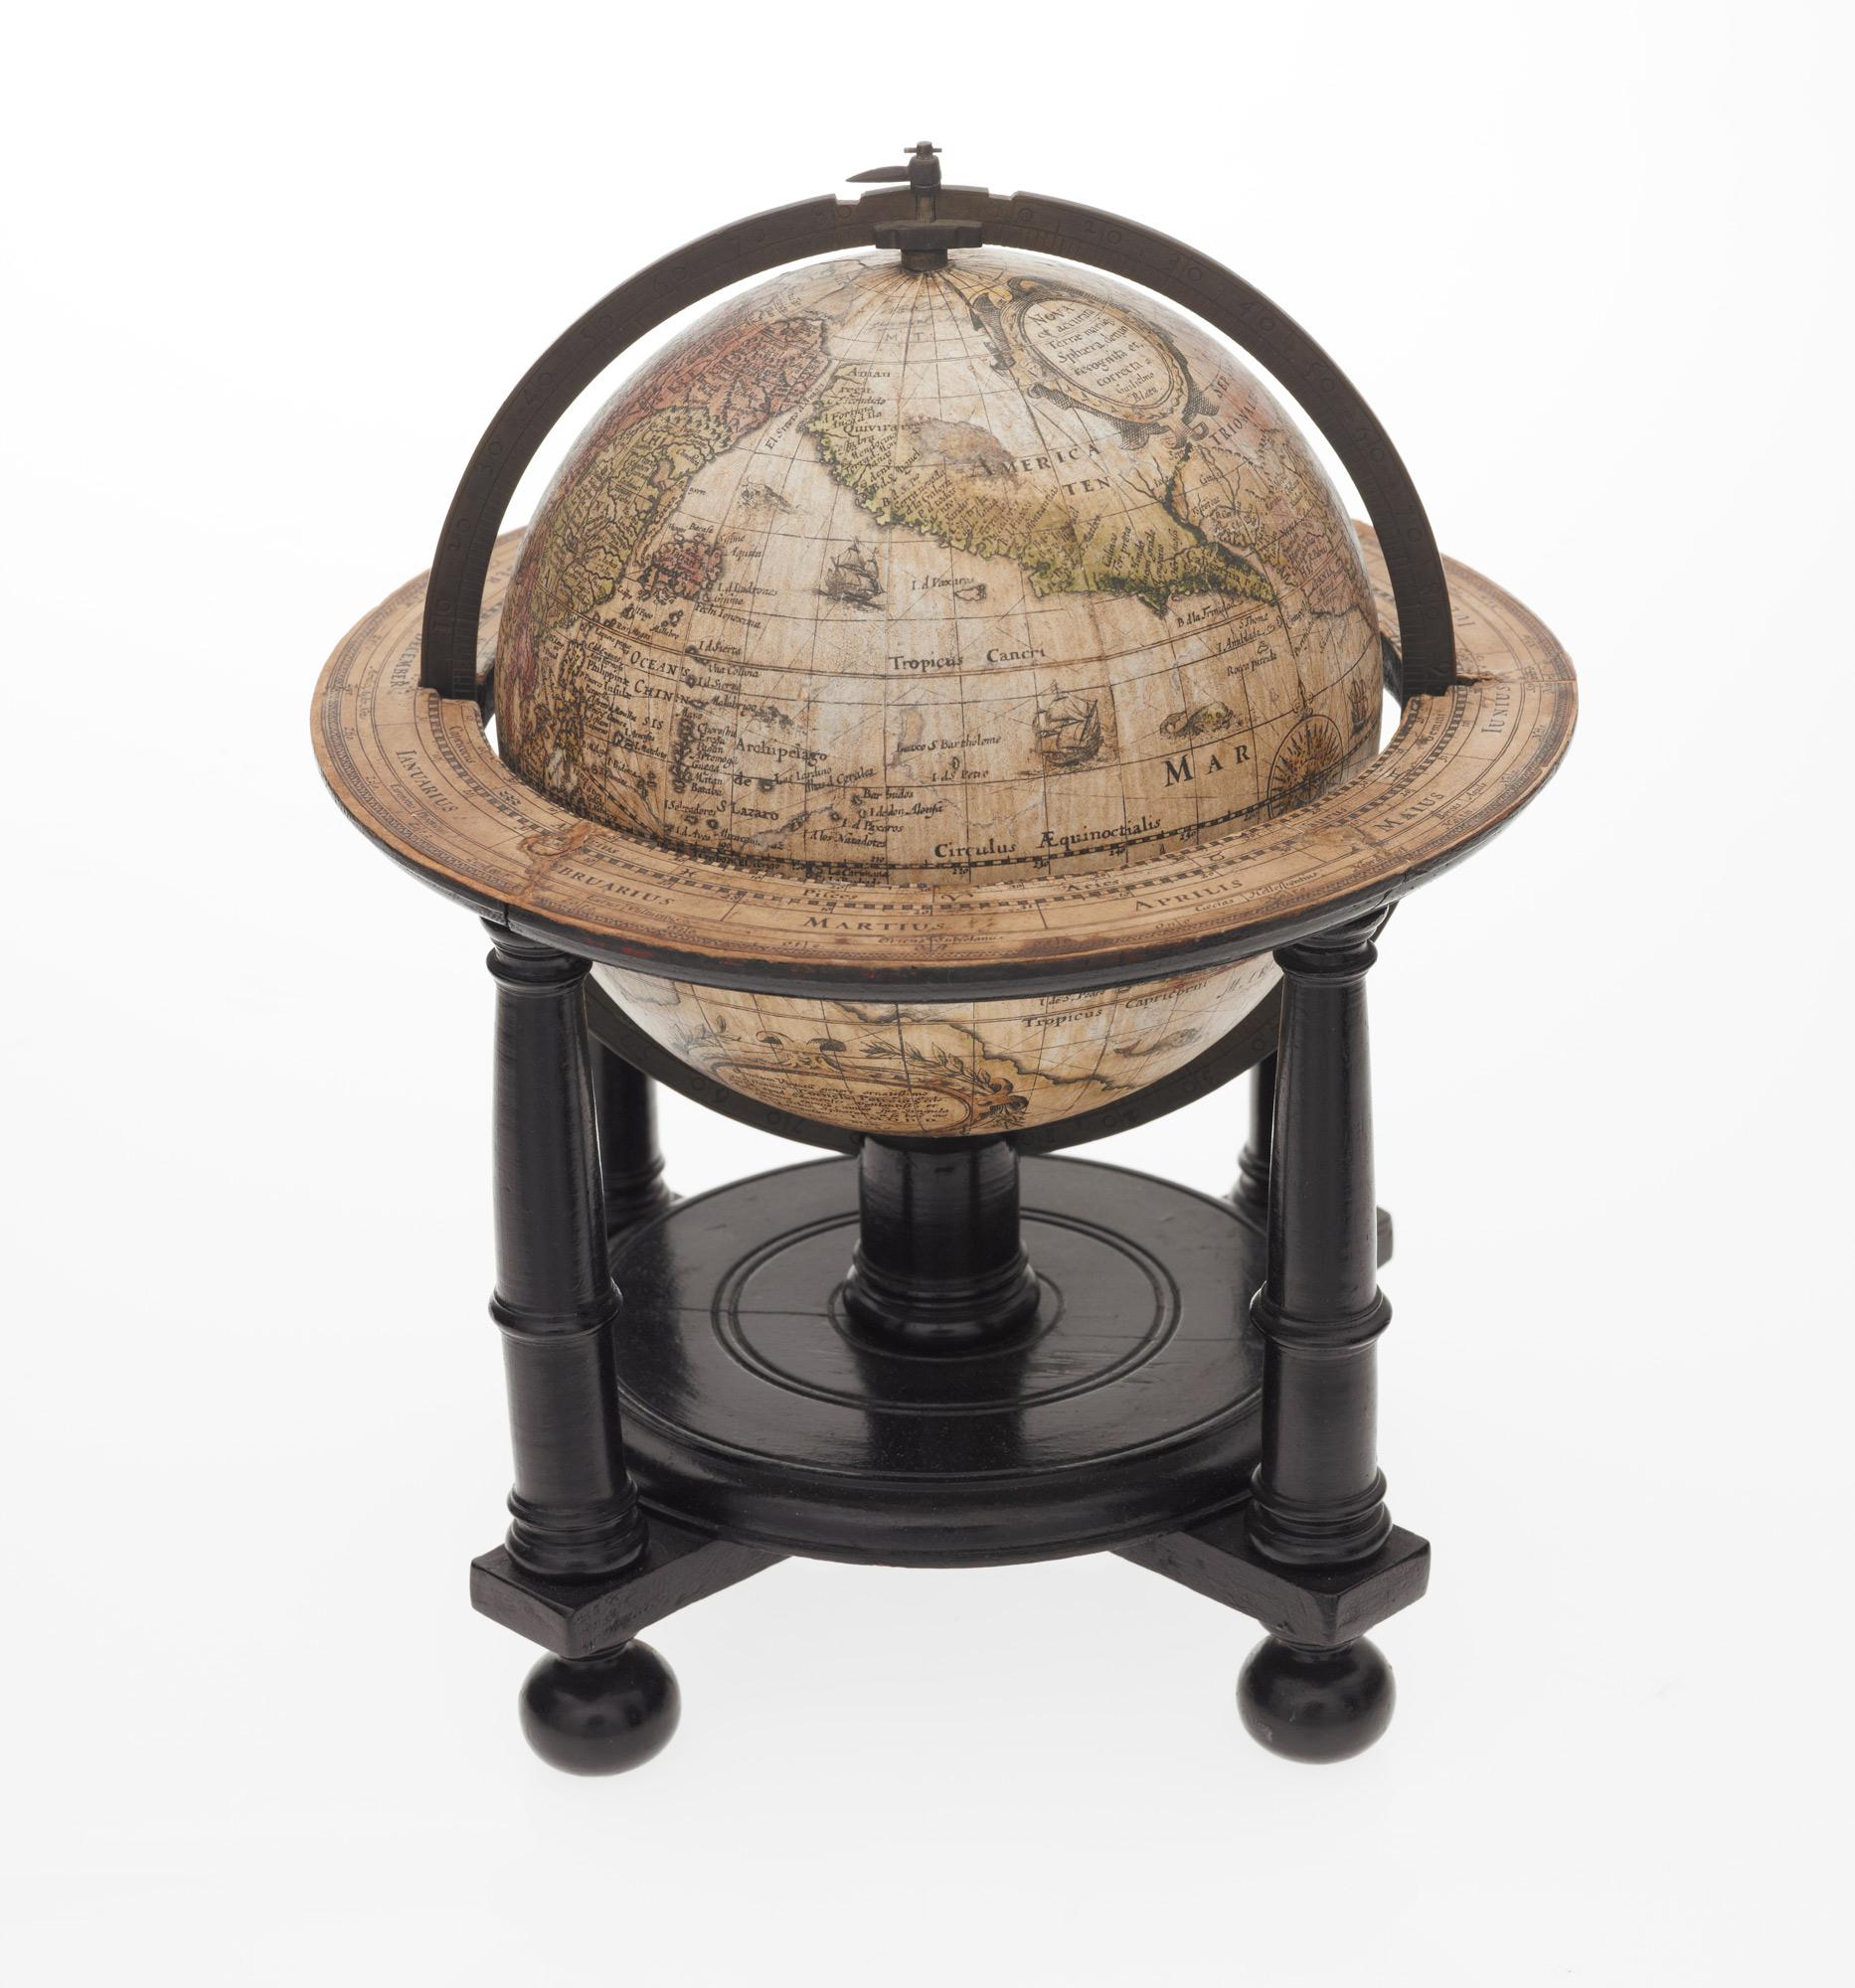 Willem Janszoon Blaeu, Nova et accurata Terrae Marisq. Sphaera, denuo recognita et correcta à Gulielmo Blaeu.Amsterdam, 1606 (1621)